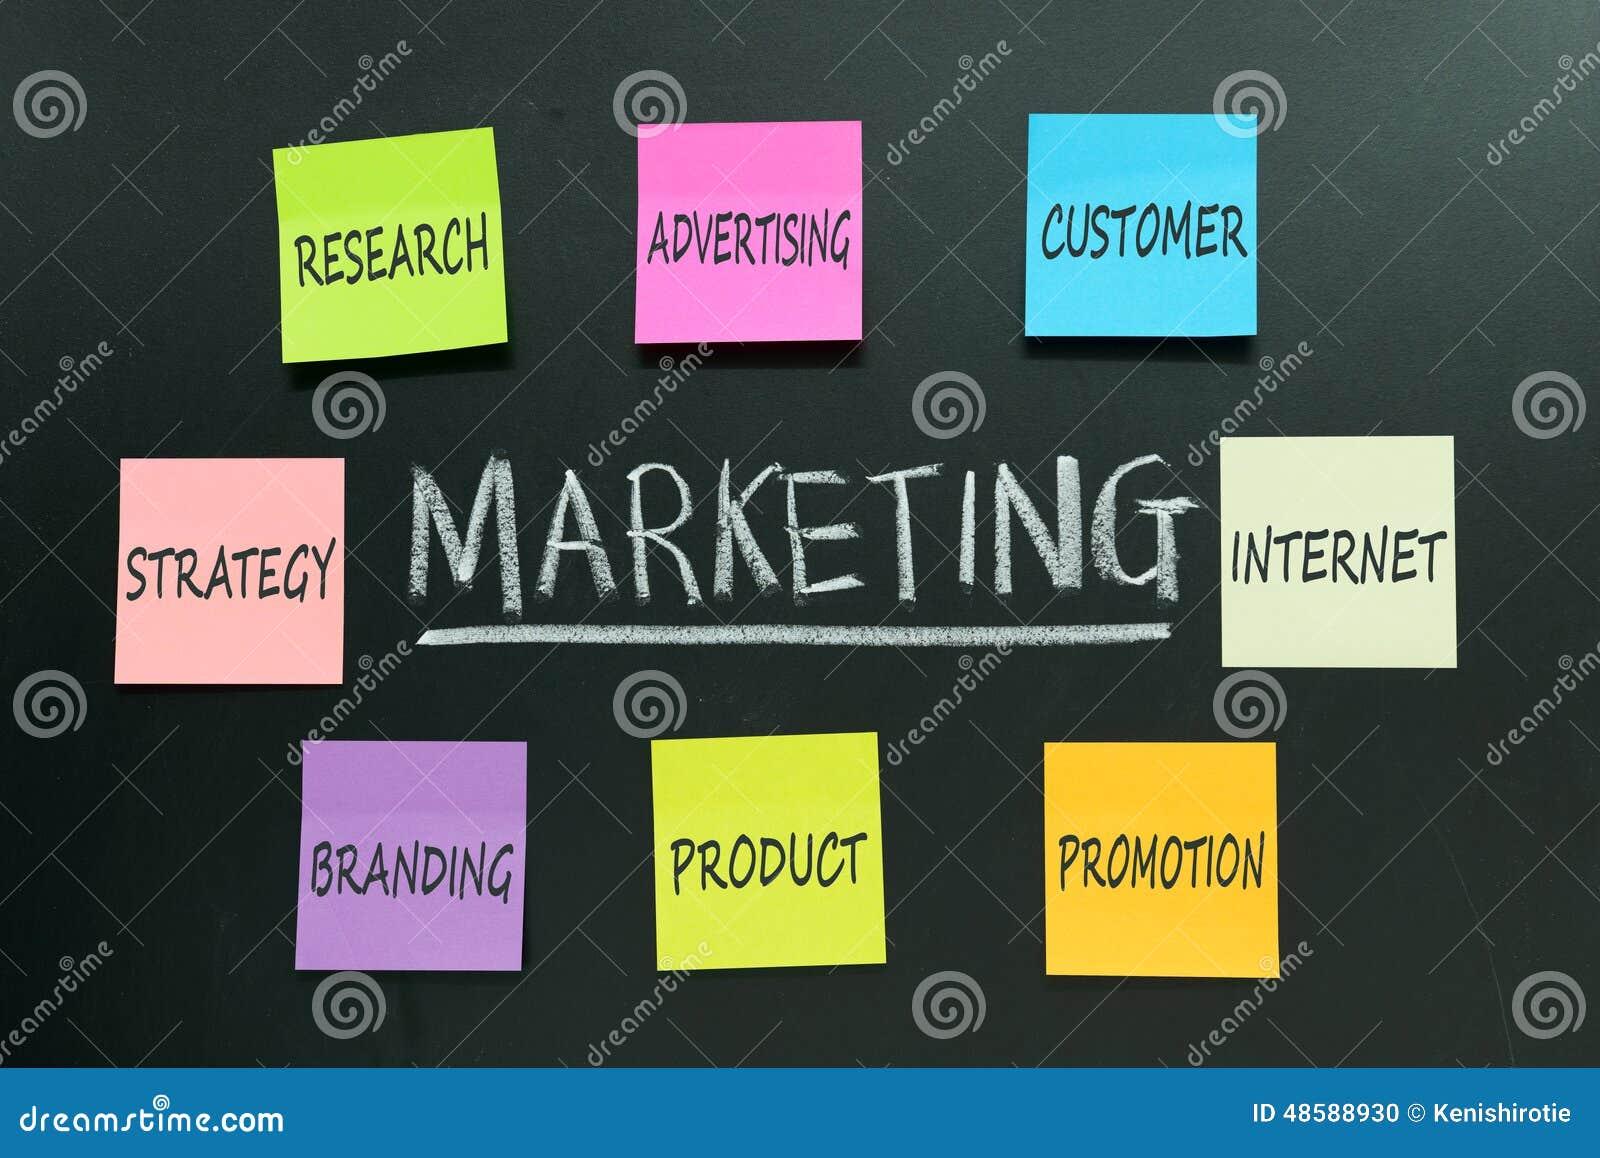 Plan de márketing